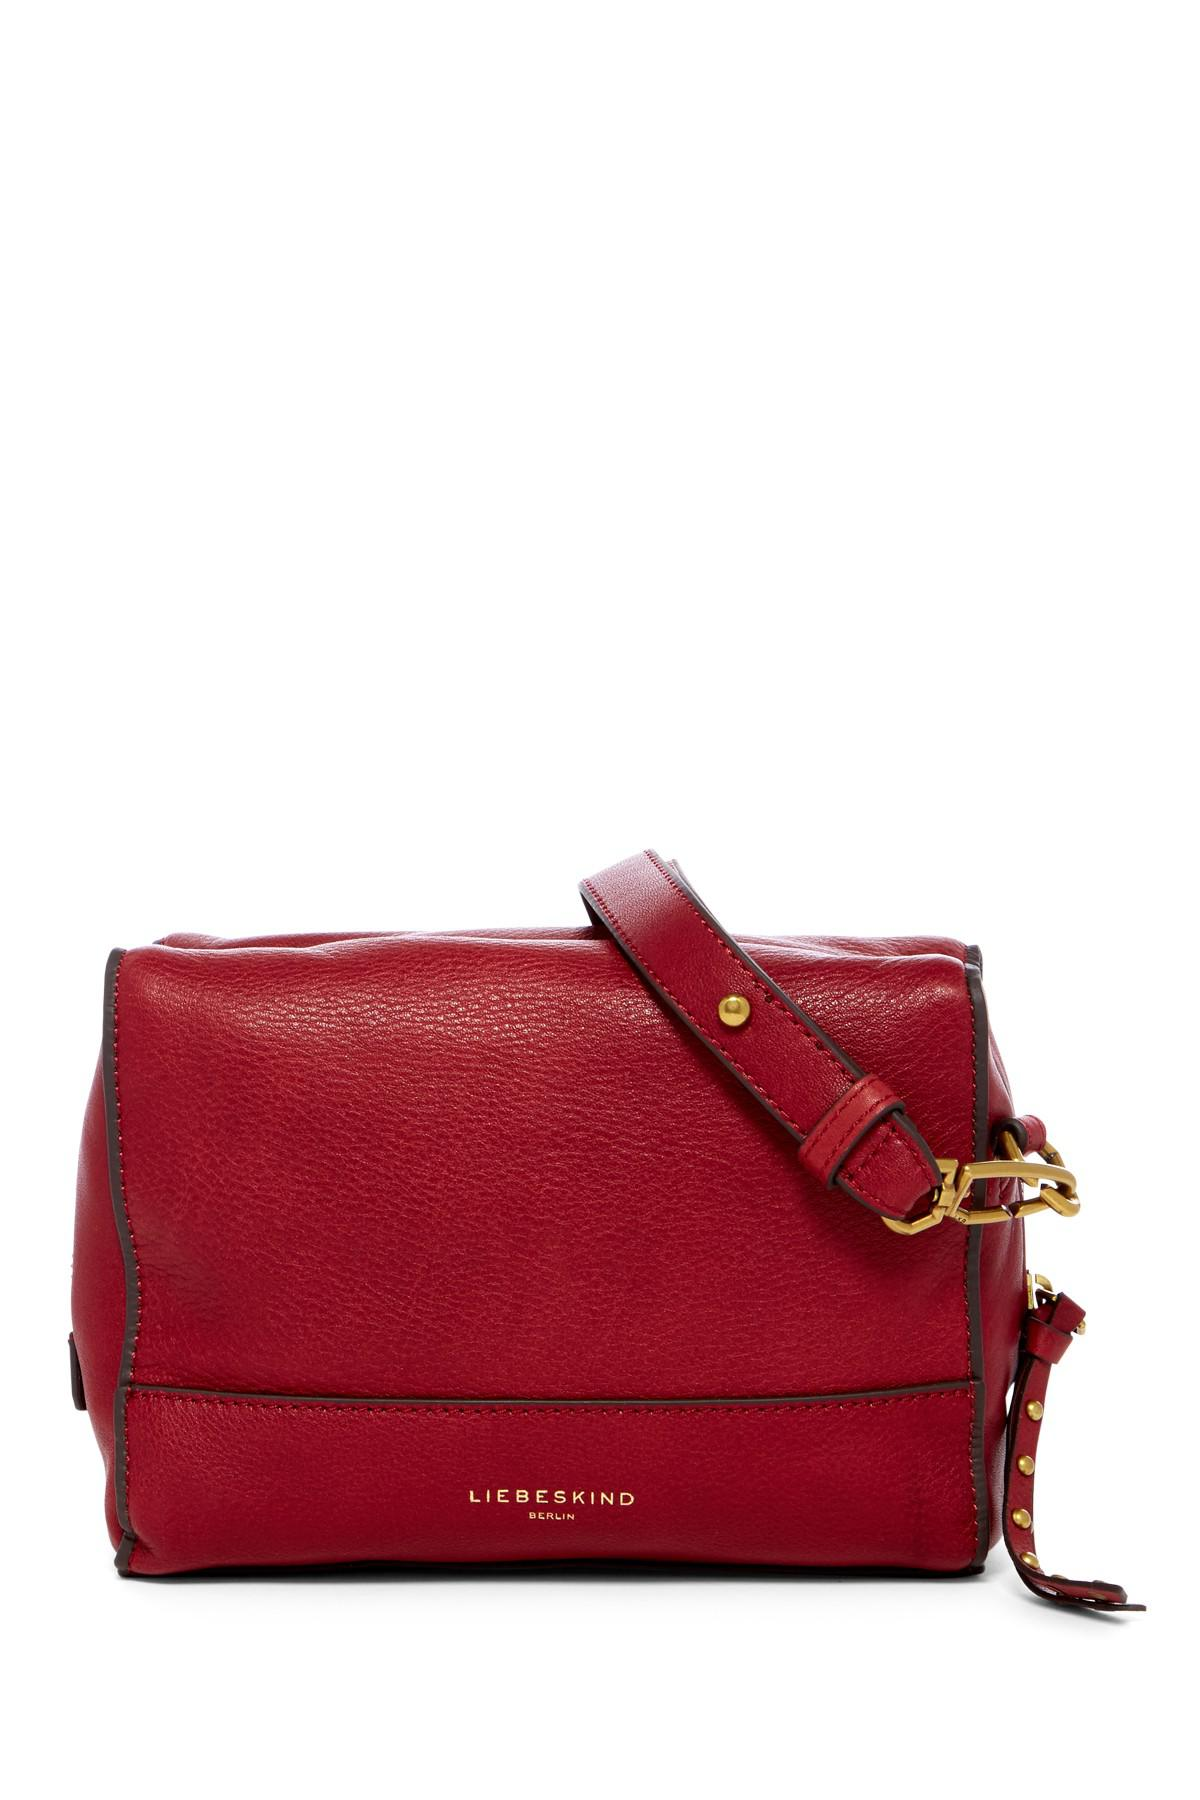 Liebeskind Berlin Syracuse Milano Leather Crossbody Bag Lyst